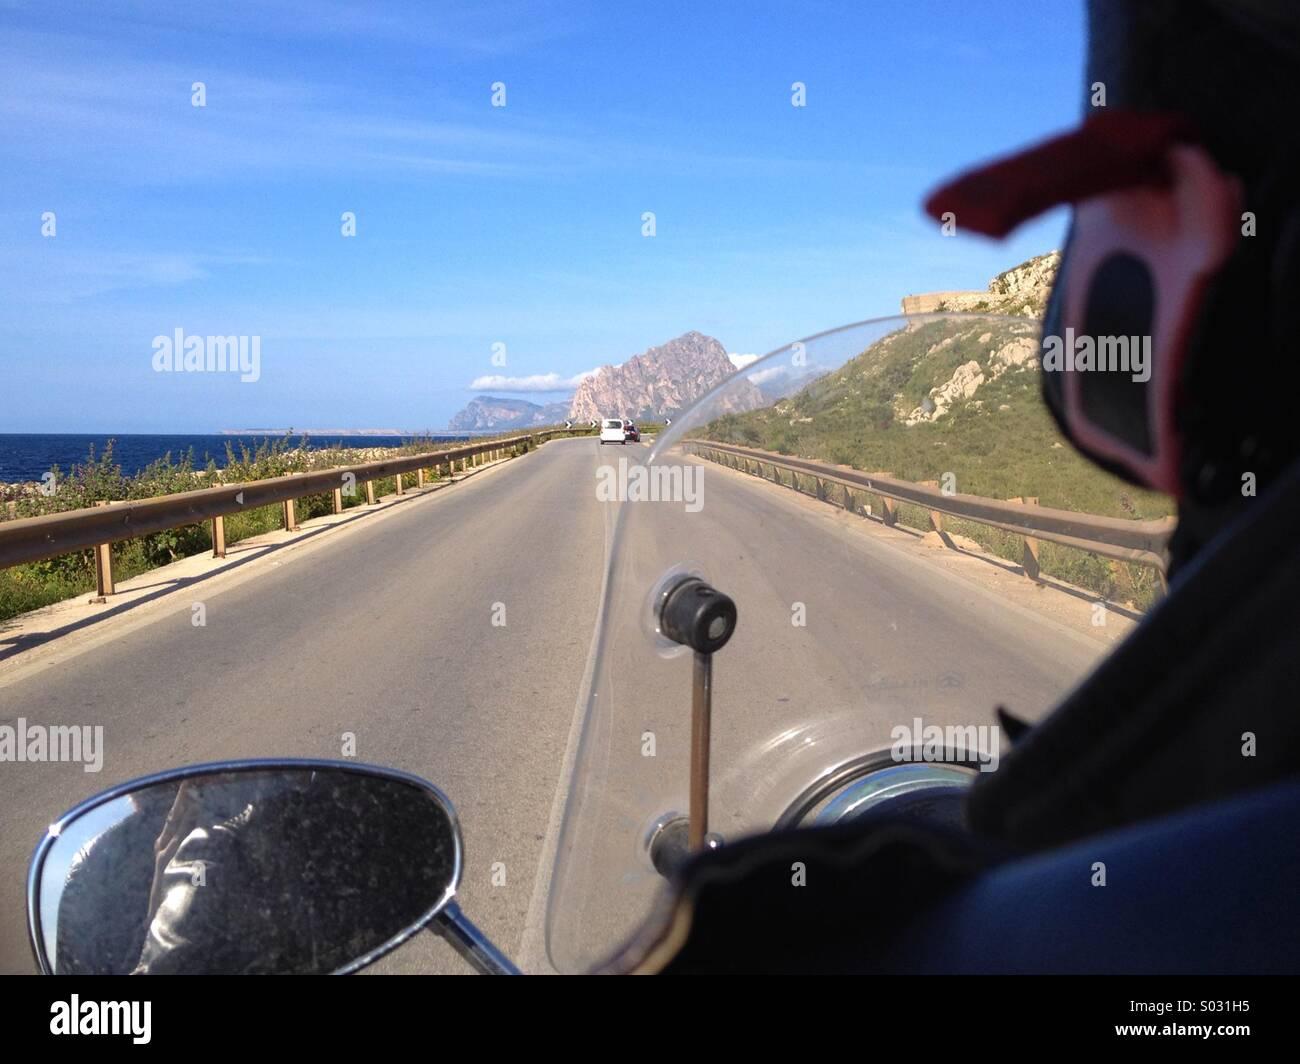 Driving motorbike at sea coast road - Stock Image